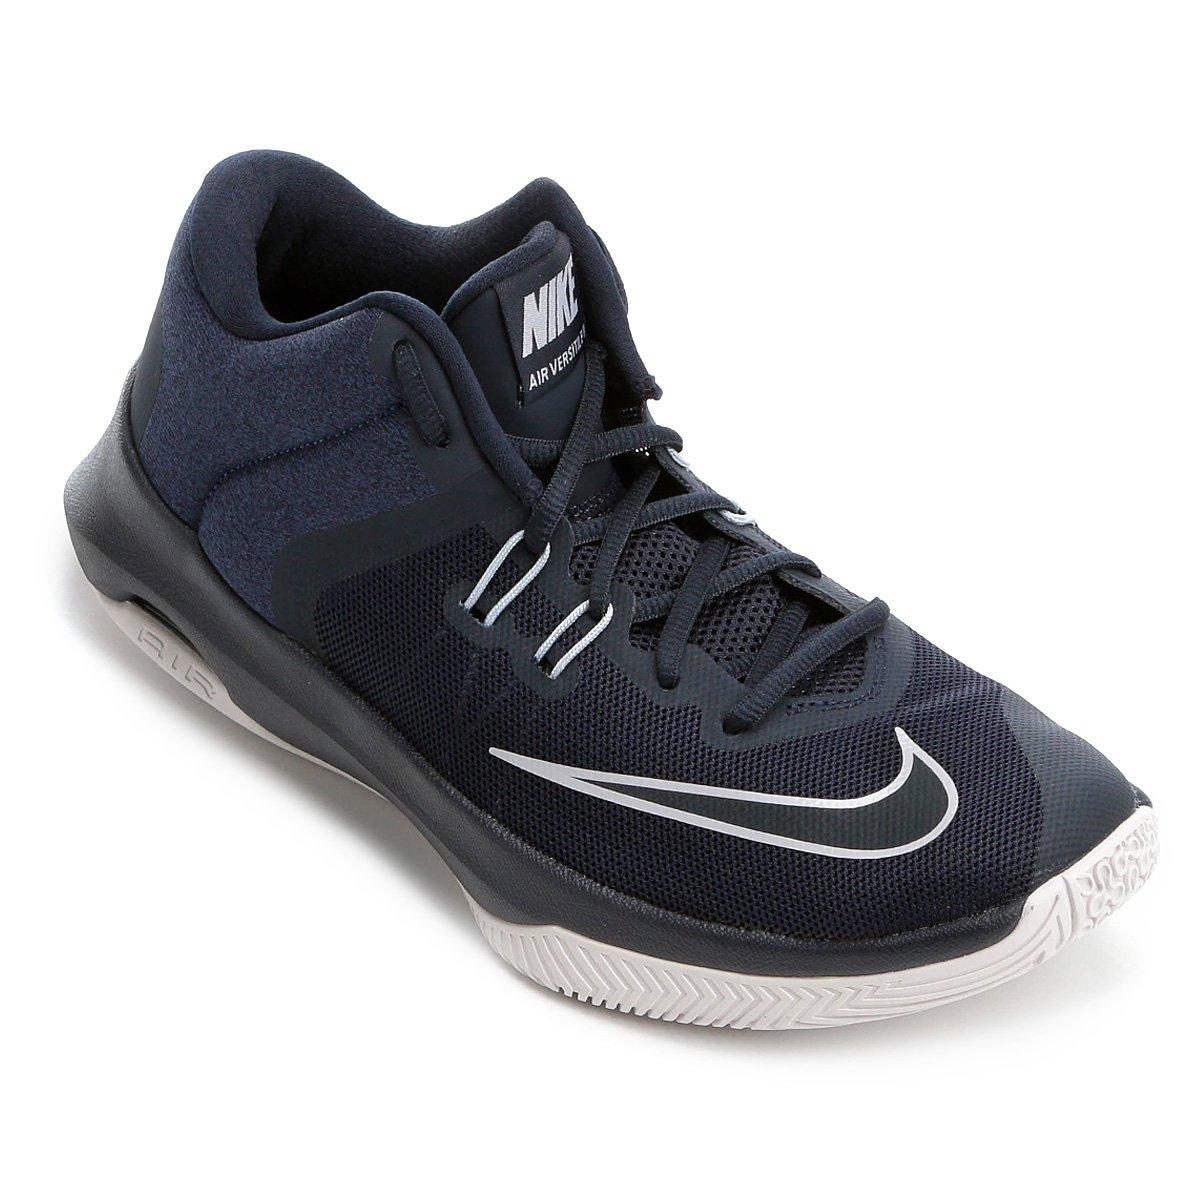 44a1779166 Tênis Nike Air Versitile II Masculino - Marinho - Compre Agora ...